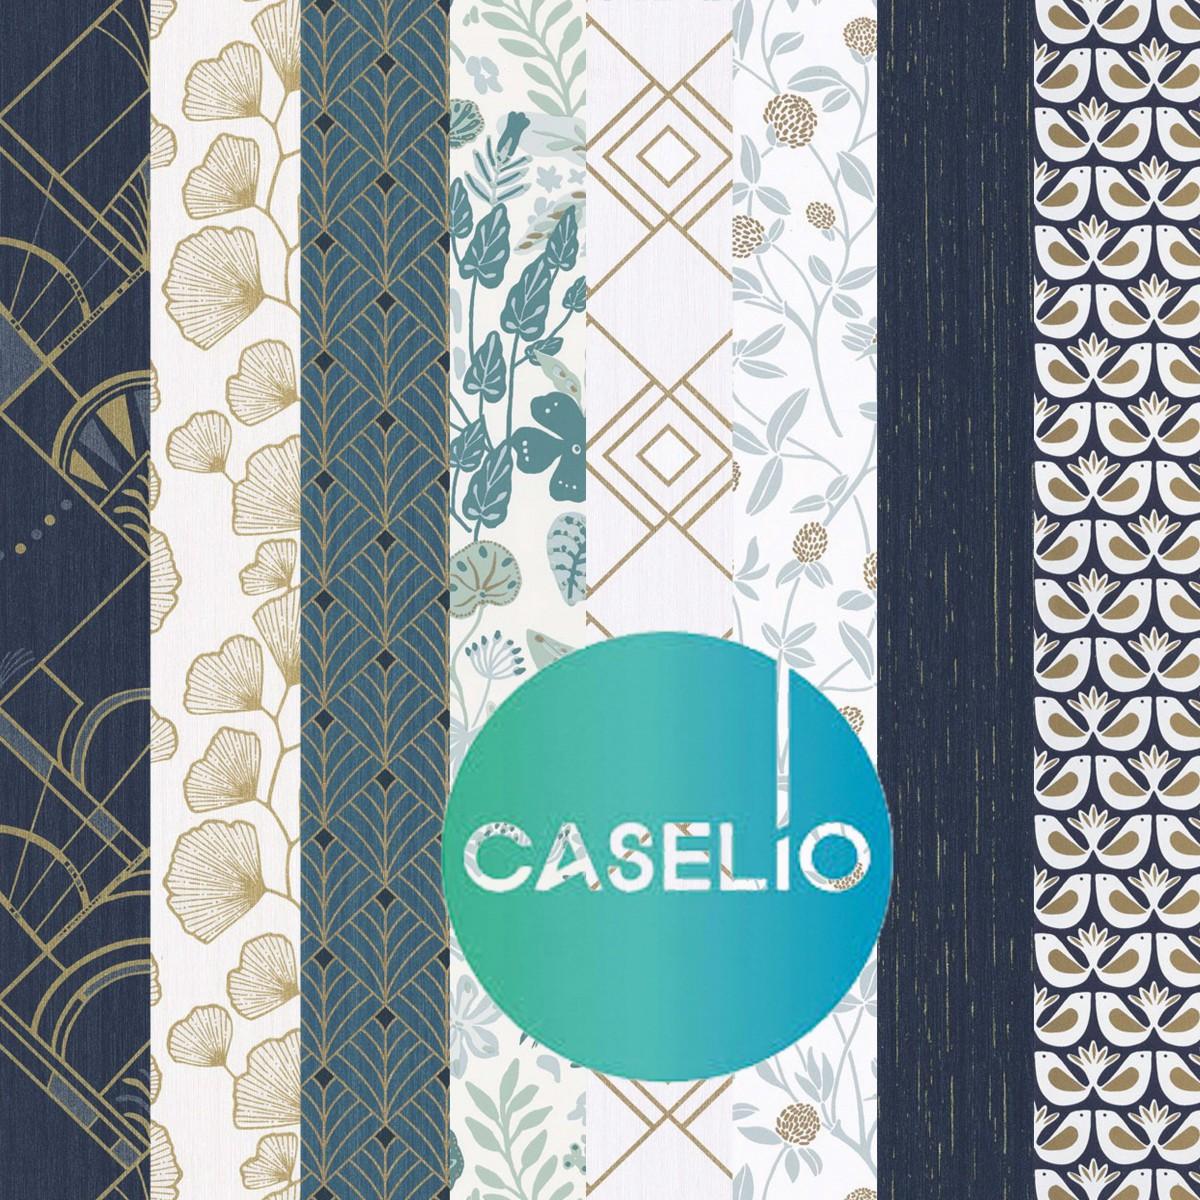 caselio-couverture-2-1